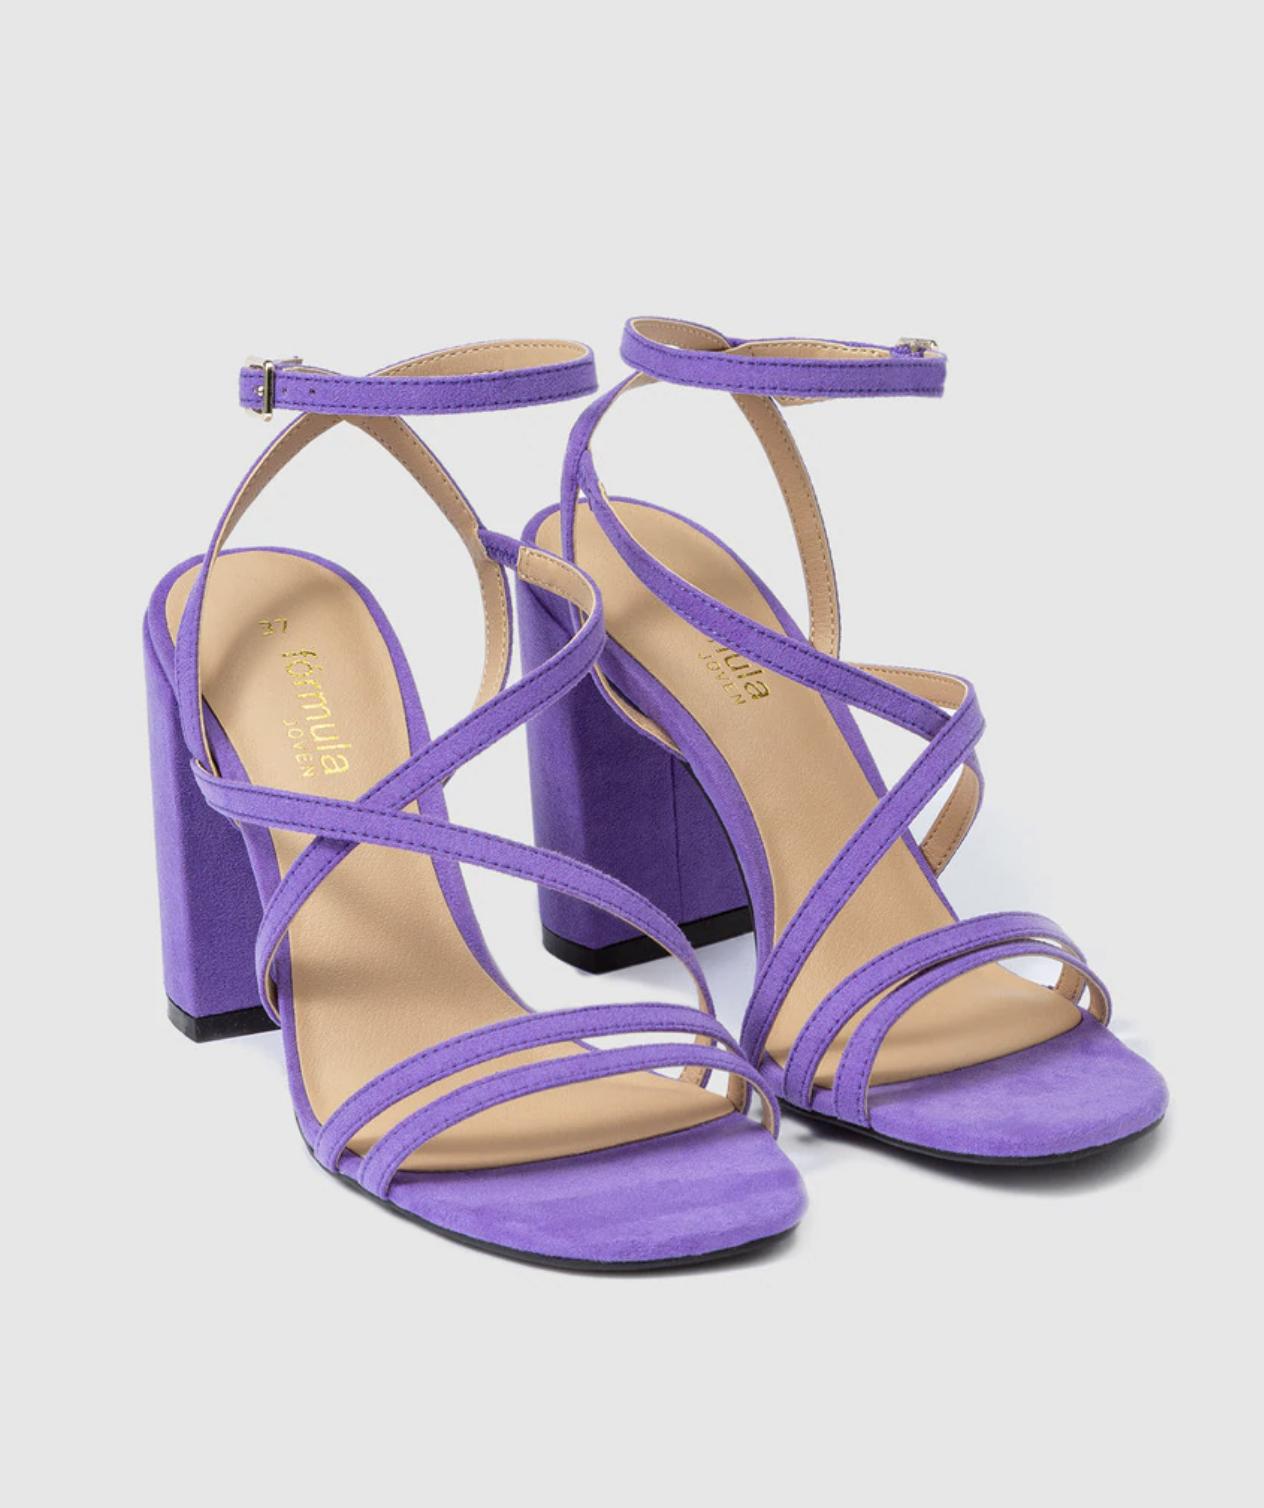 Sandalias de tacón de mujer Fórmula Joven con tiras de color morado